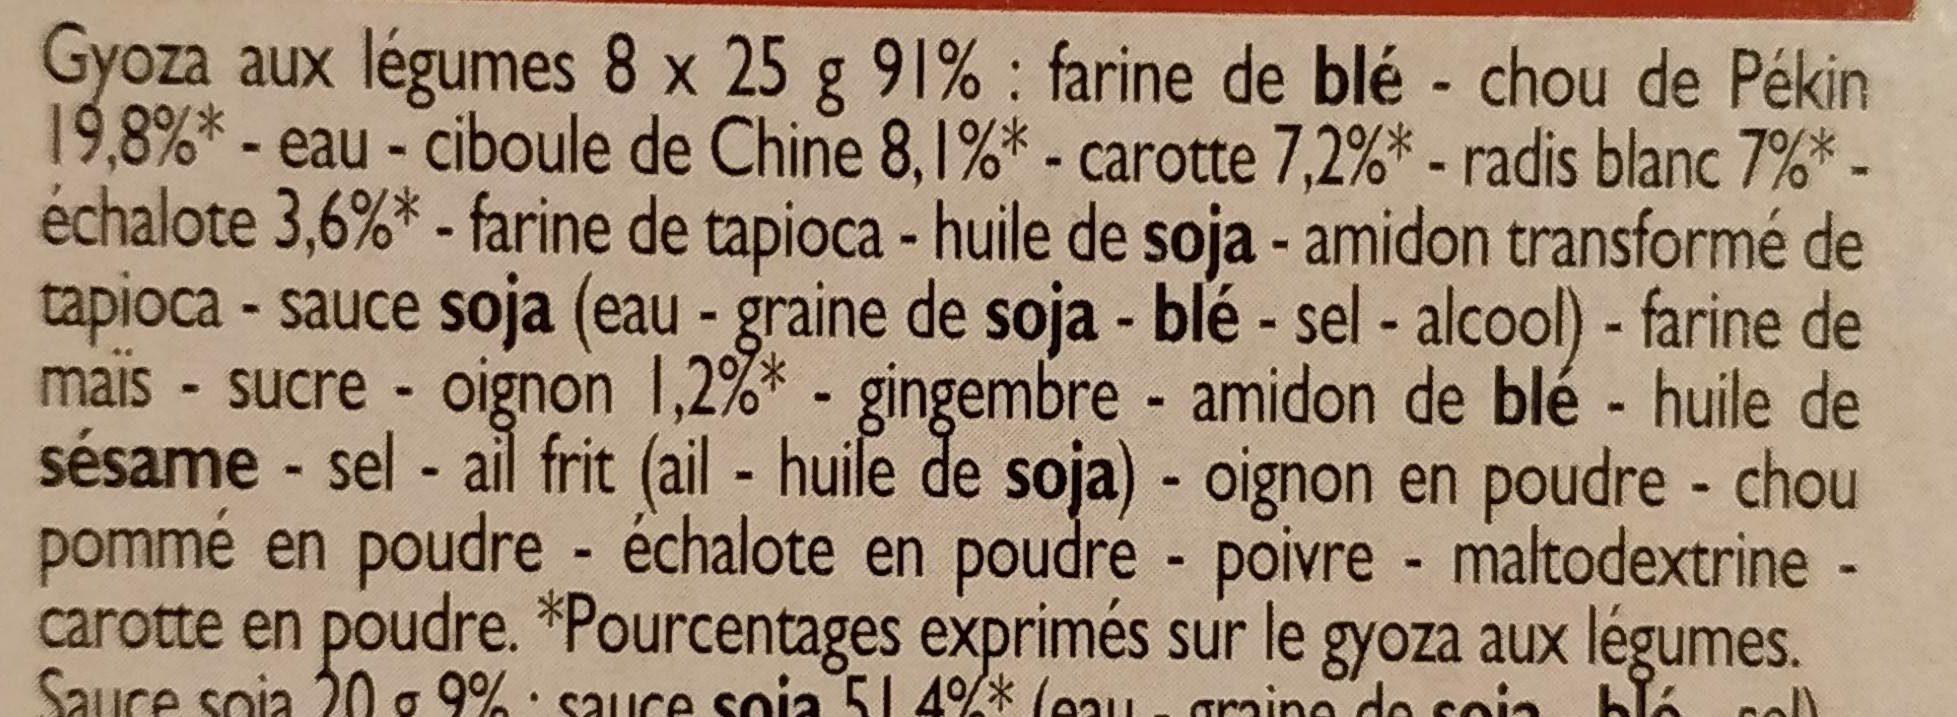 Gyoza aux légumes, sauce soja - Ingredients - fr